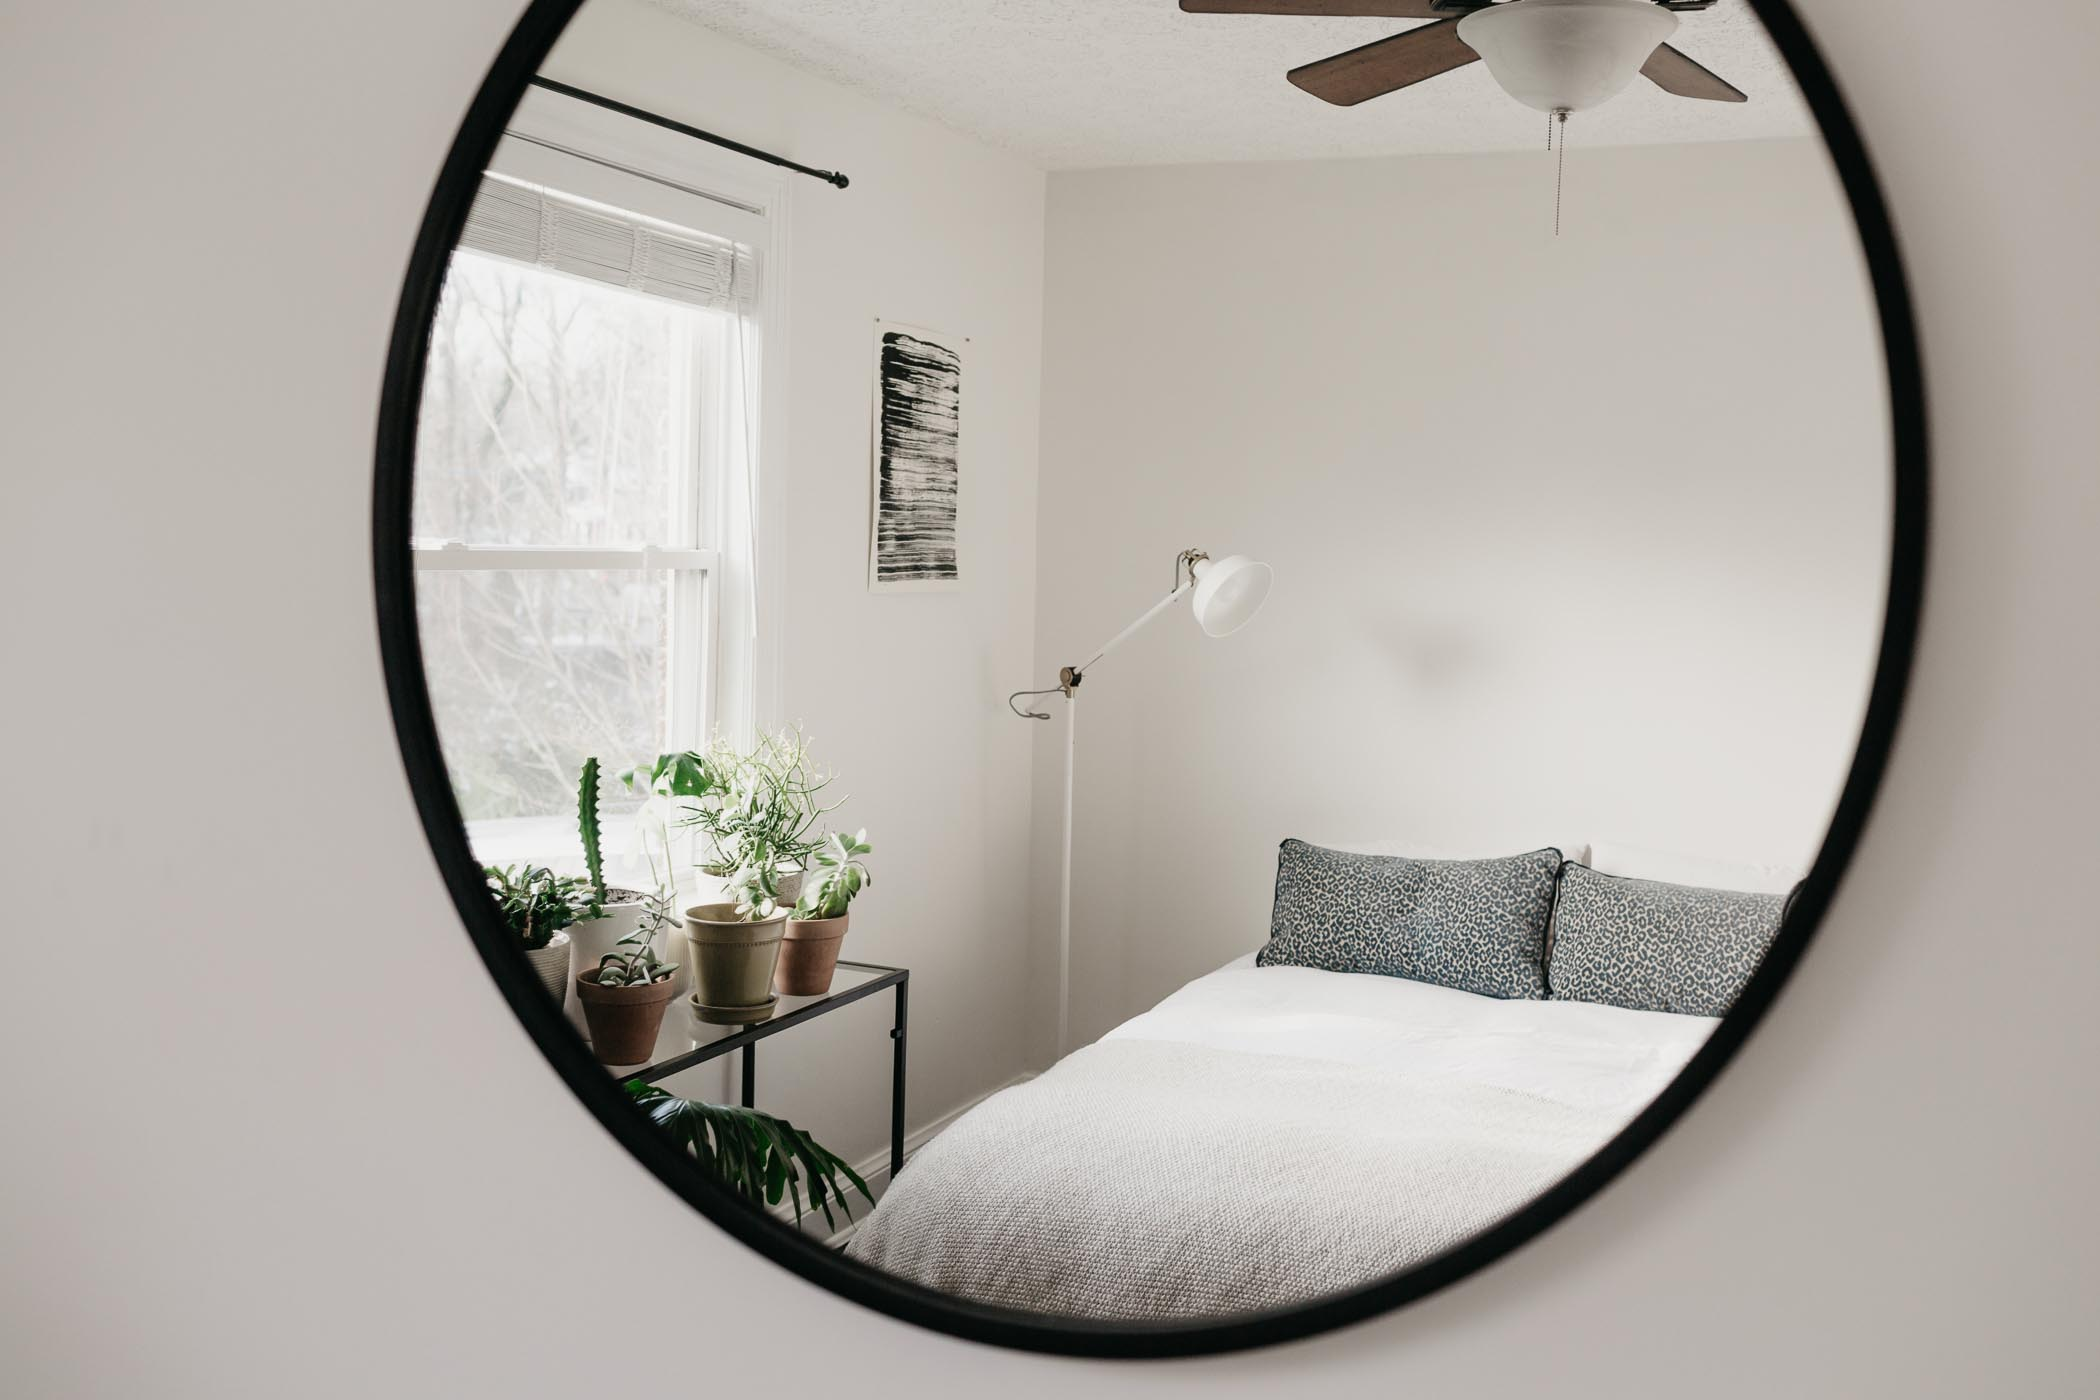 cozy-casa-nashville-tn-natural-light-studio-photography-ideas-lifestyle-photographer-photography-9.jpg